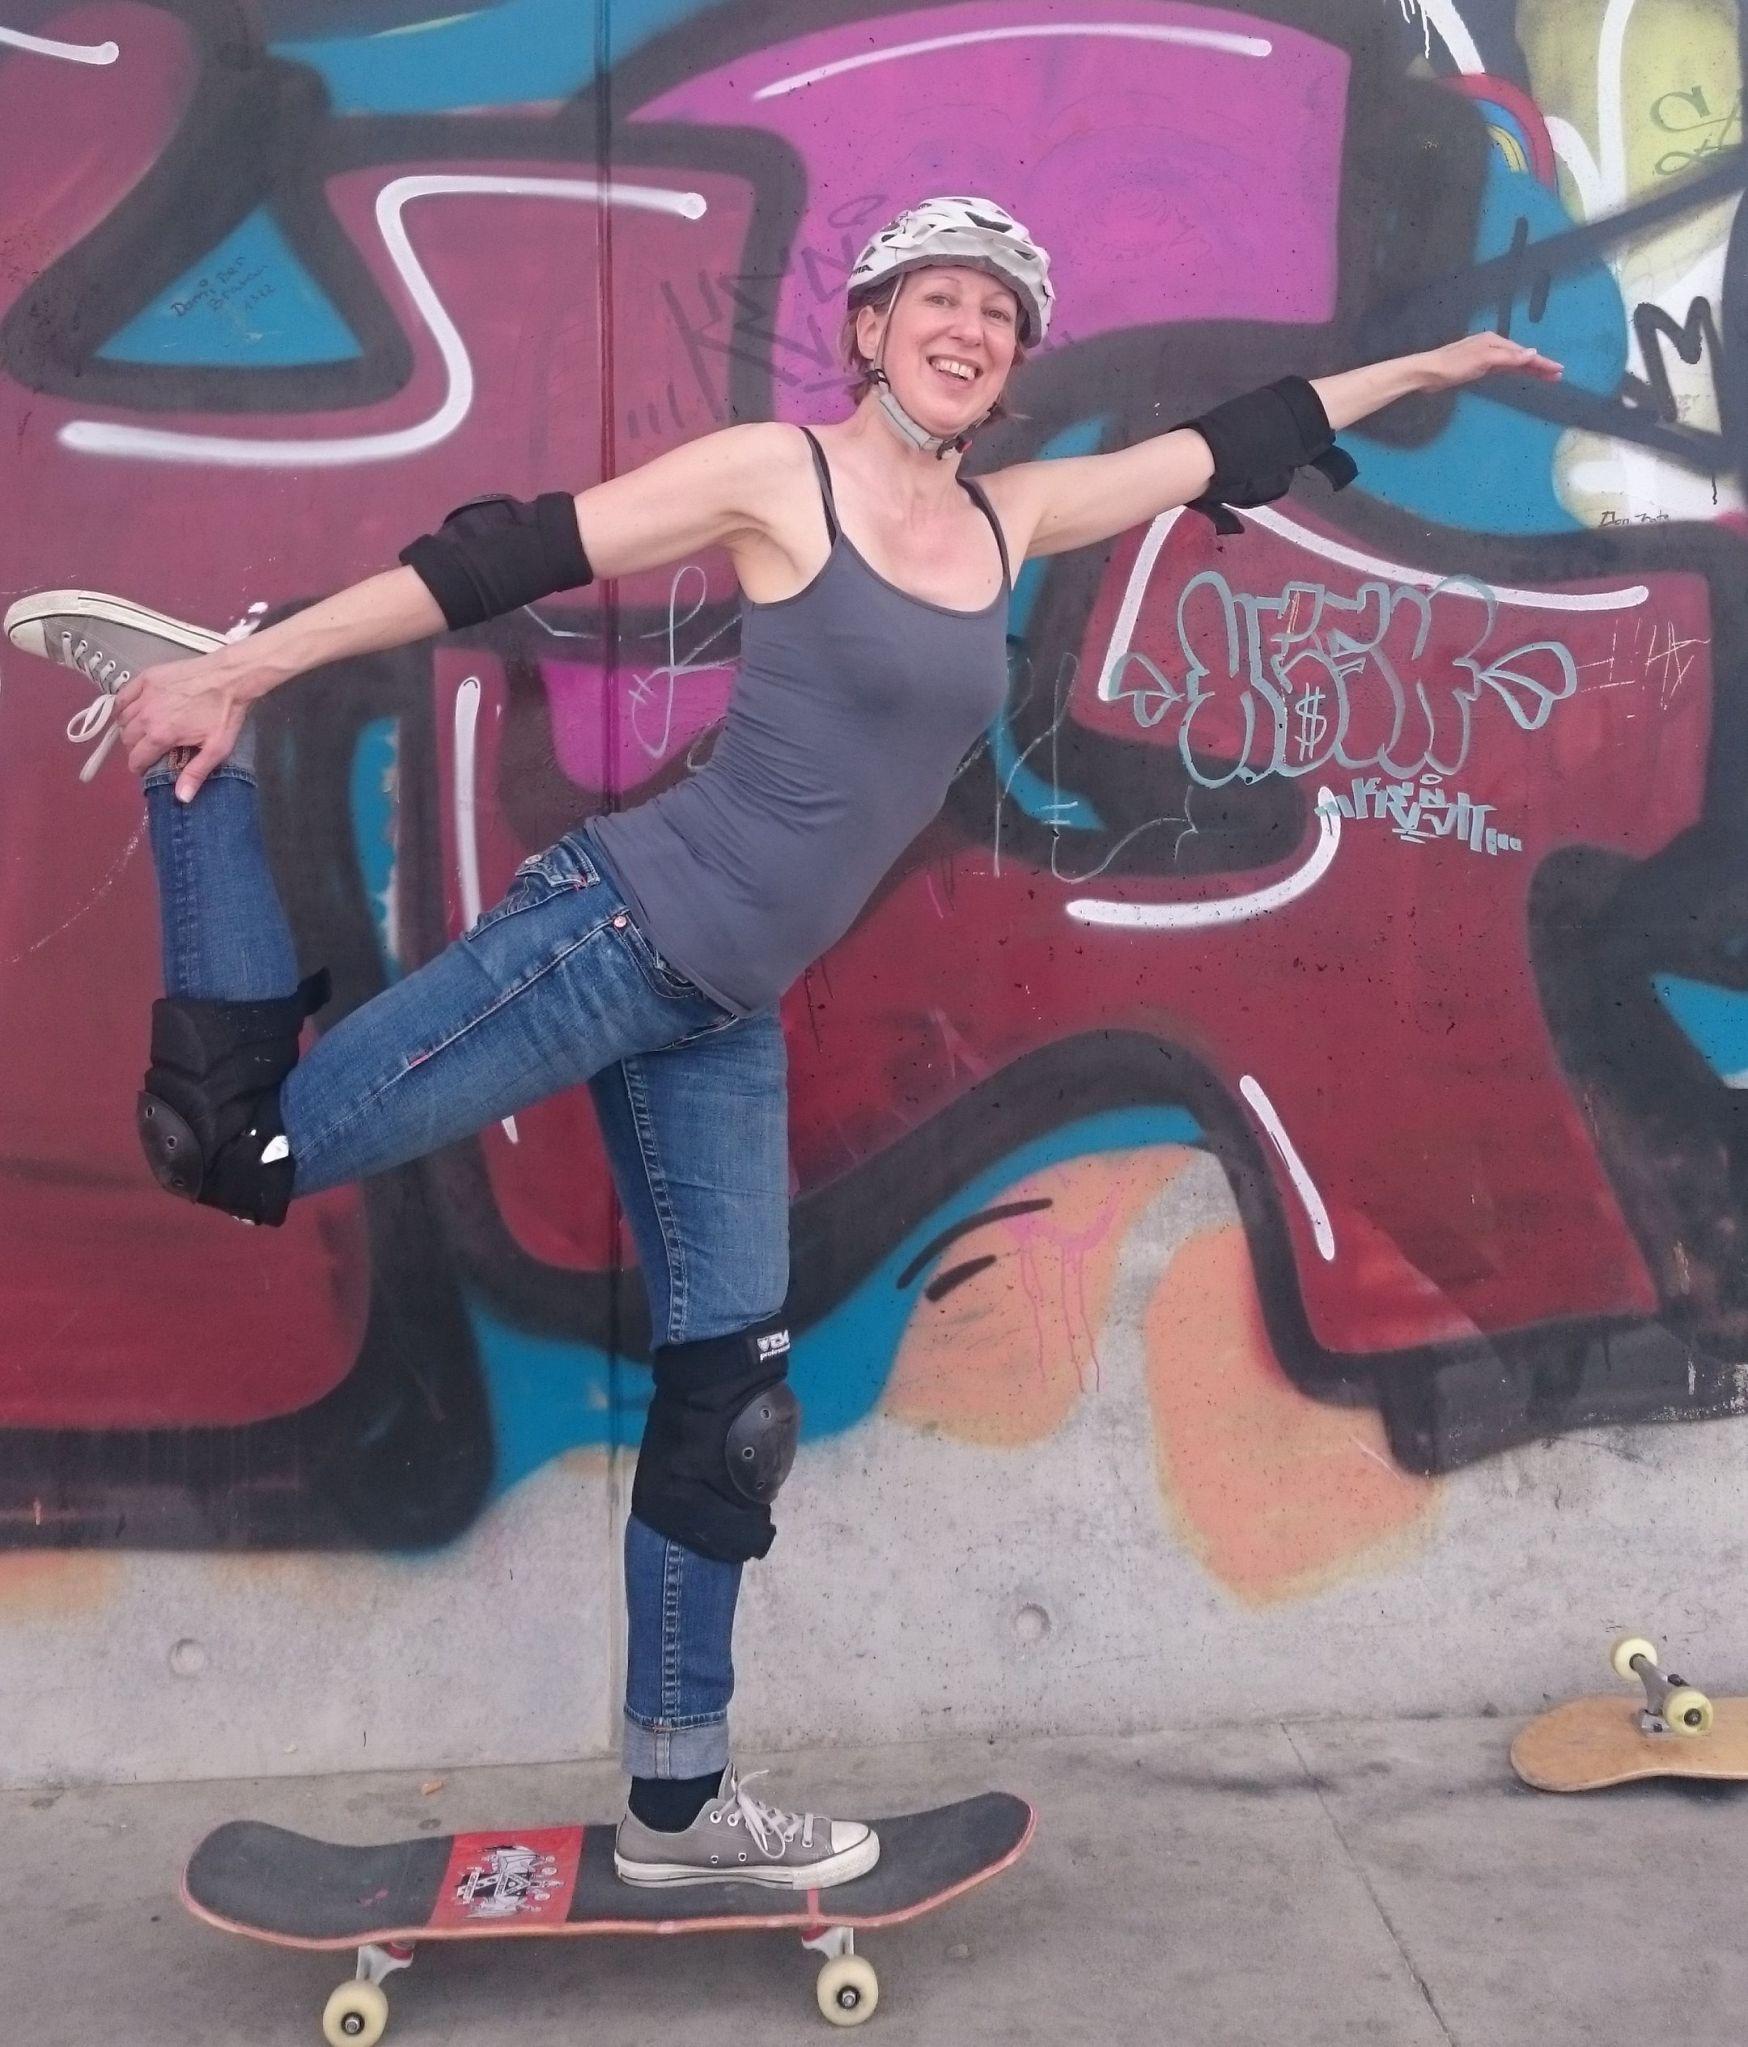 Skateyoga #skateyoga skateboard yoga